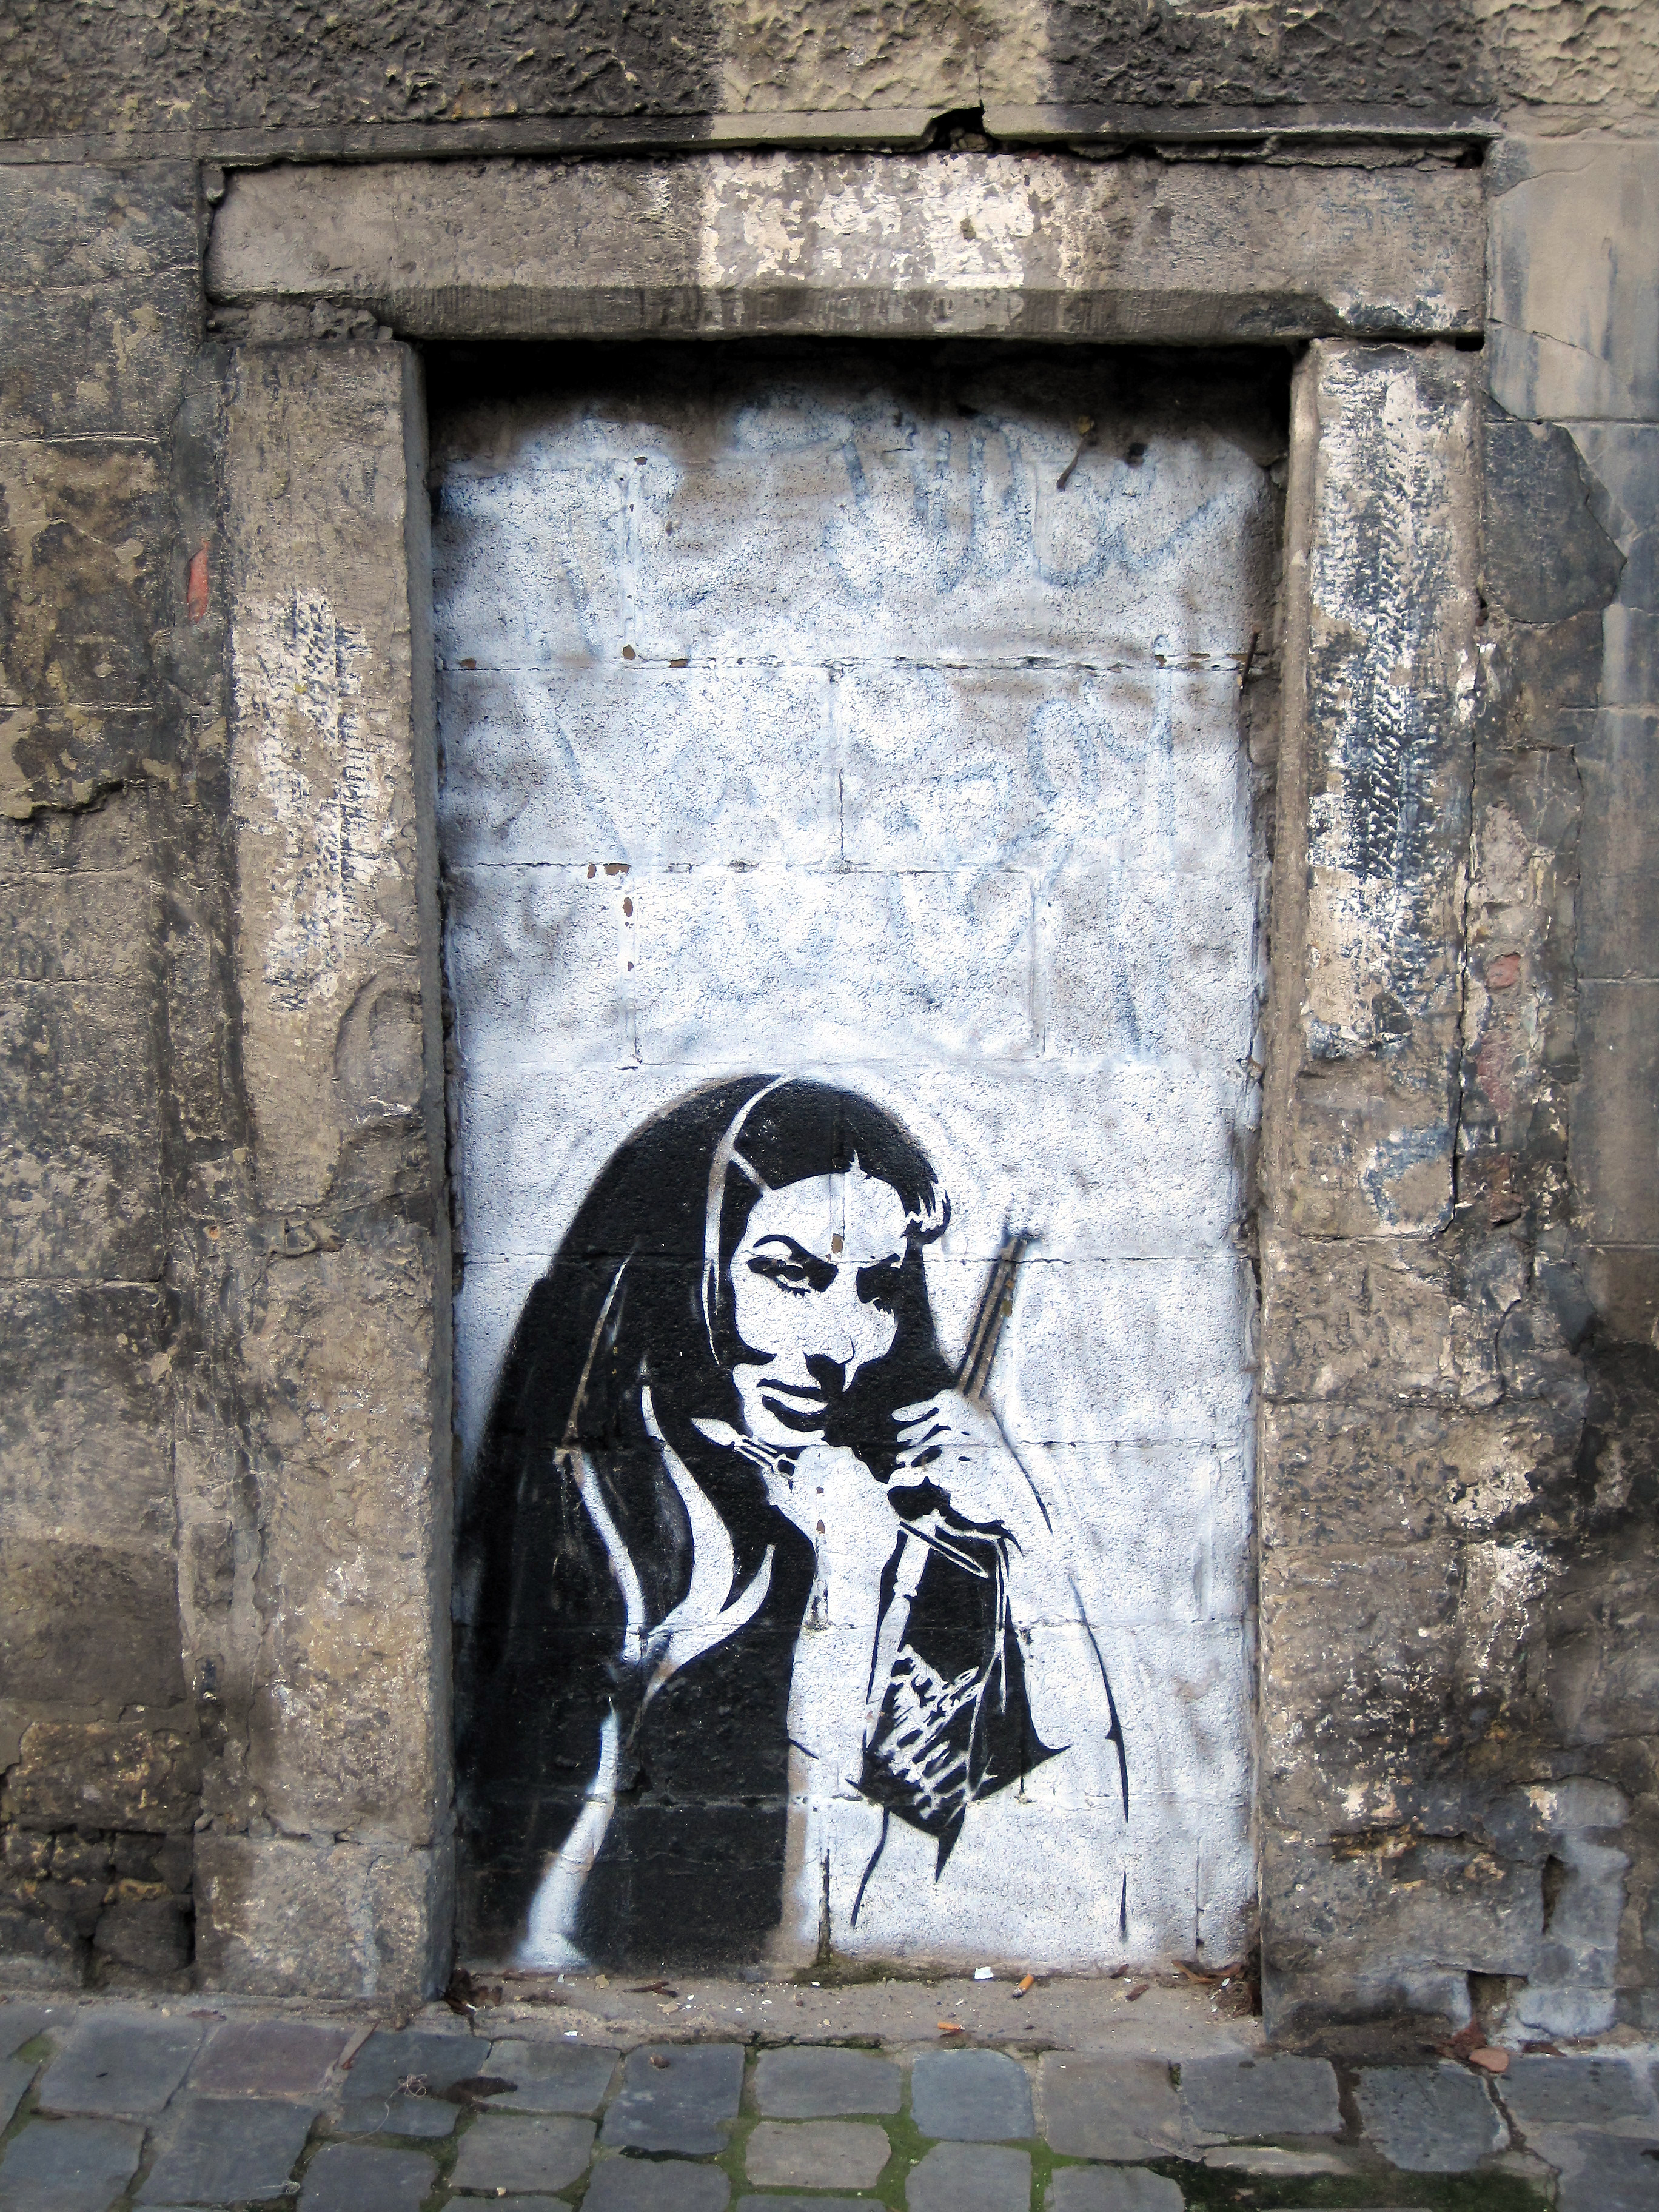 File:Namur - Graffiti 2.jpg - Wikimedia Commons  File:Namur - Gr...